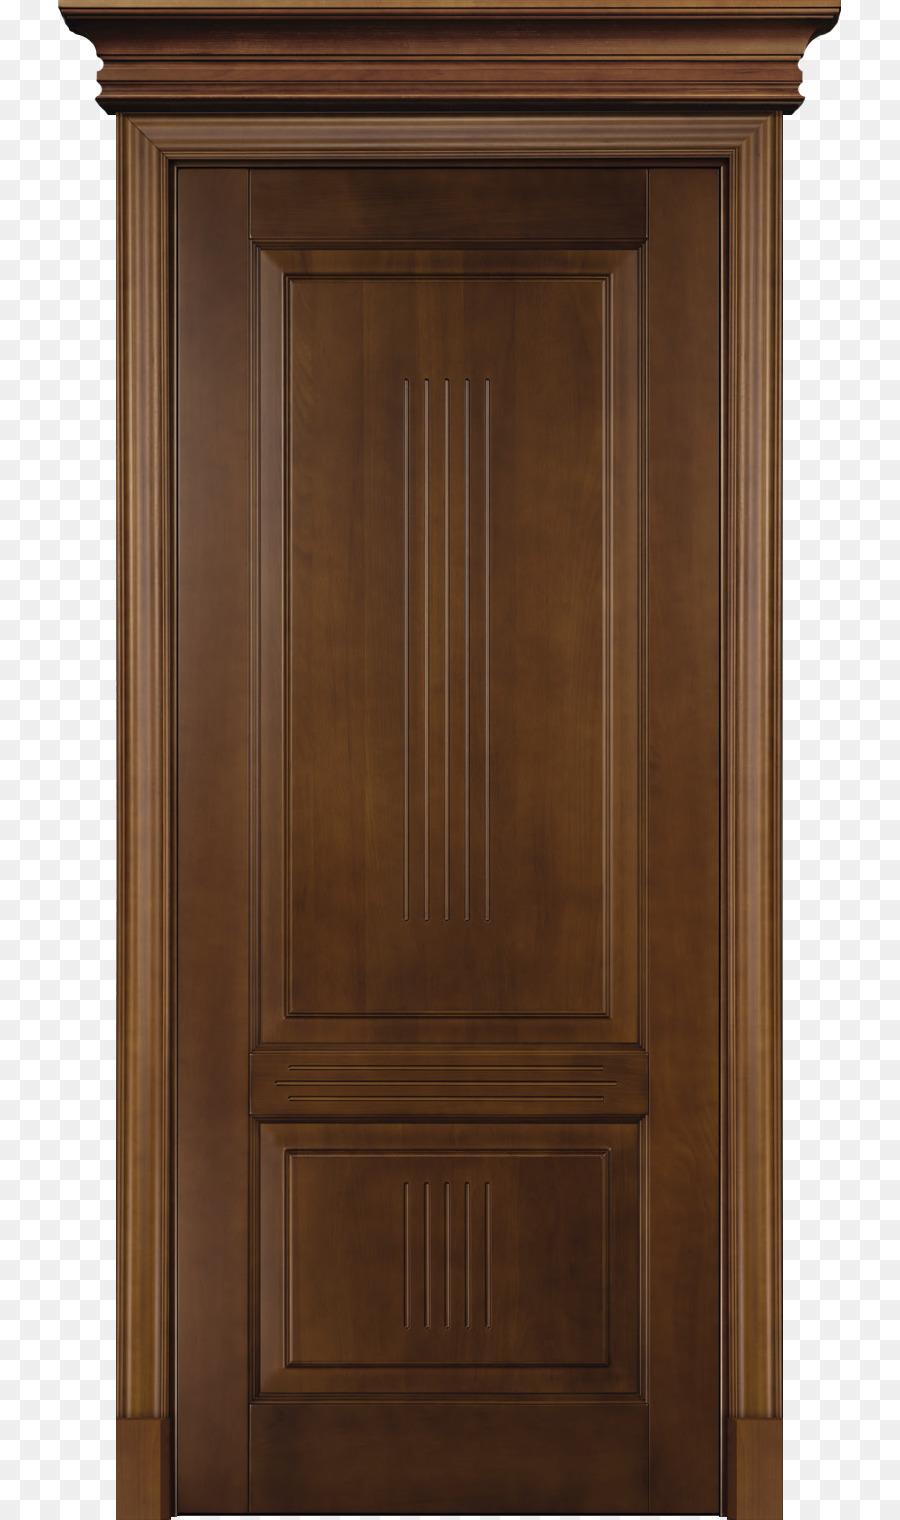 Door Interior Design Services Solid wood - solid wood doors and windows png download - 783*1520 - Free Transparent Door png Download. & Door Interior Design Services Solid wood - solid wood doors and ...